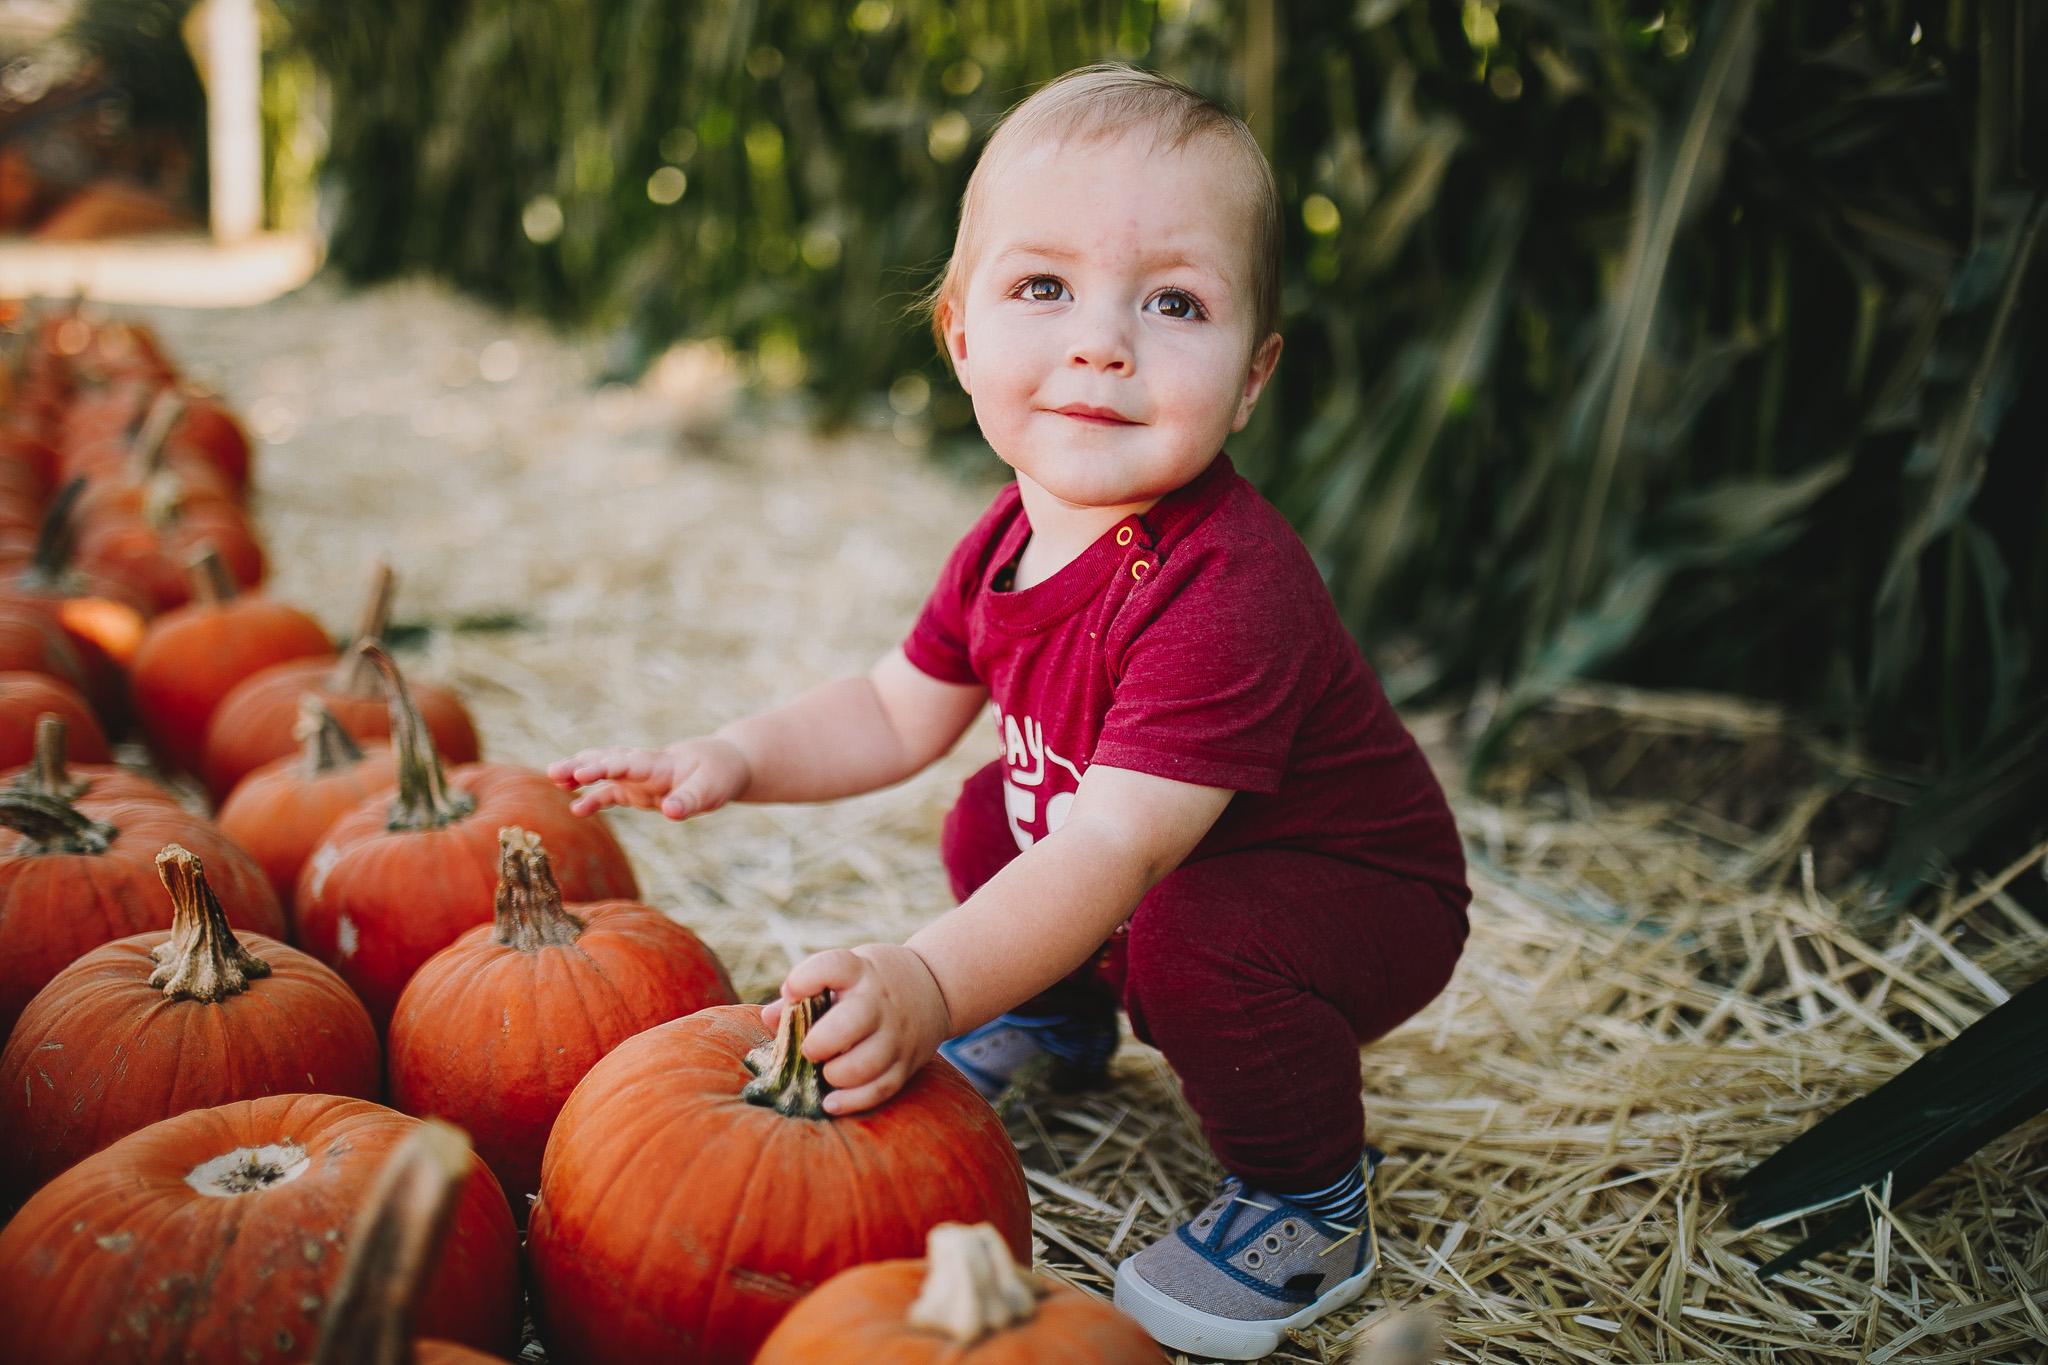 Archer_Inspired_Photography_Pumpkin_Patch_Morgan_Hill_Fall_Family_Photos-23.jpg